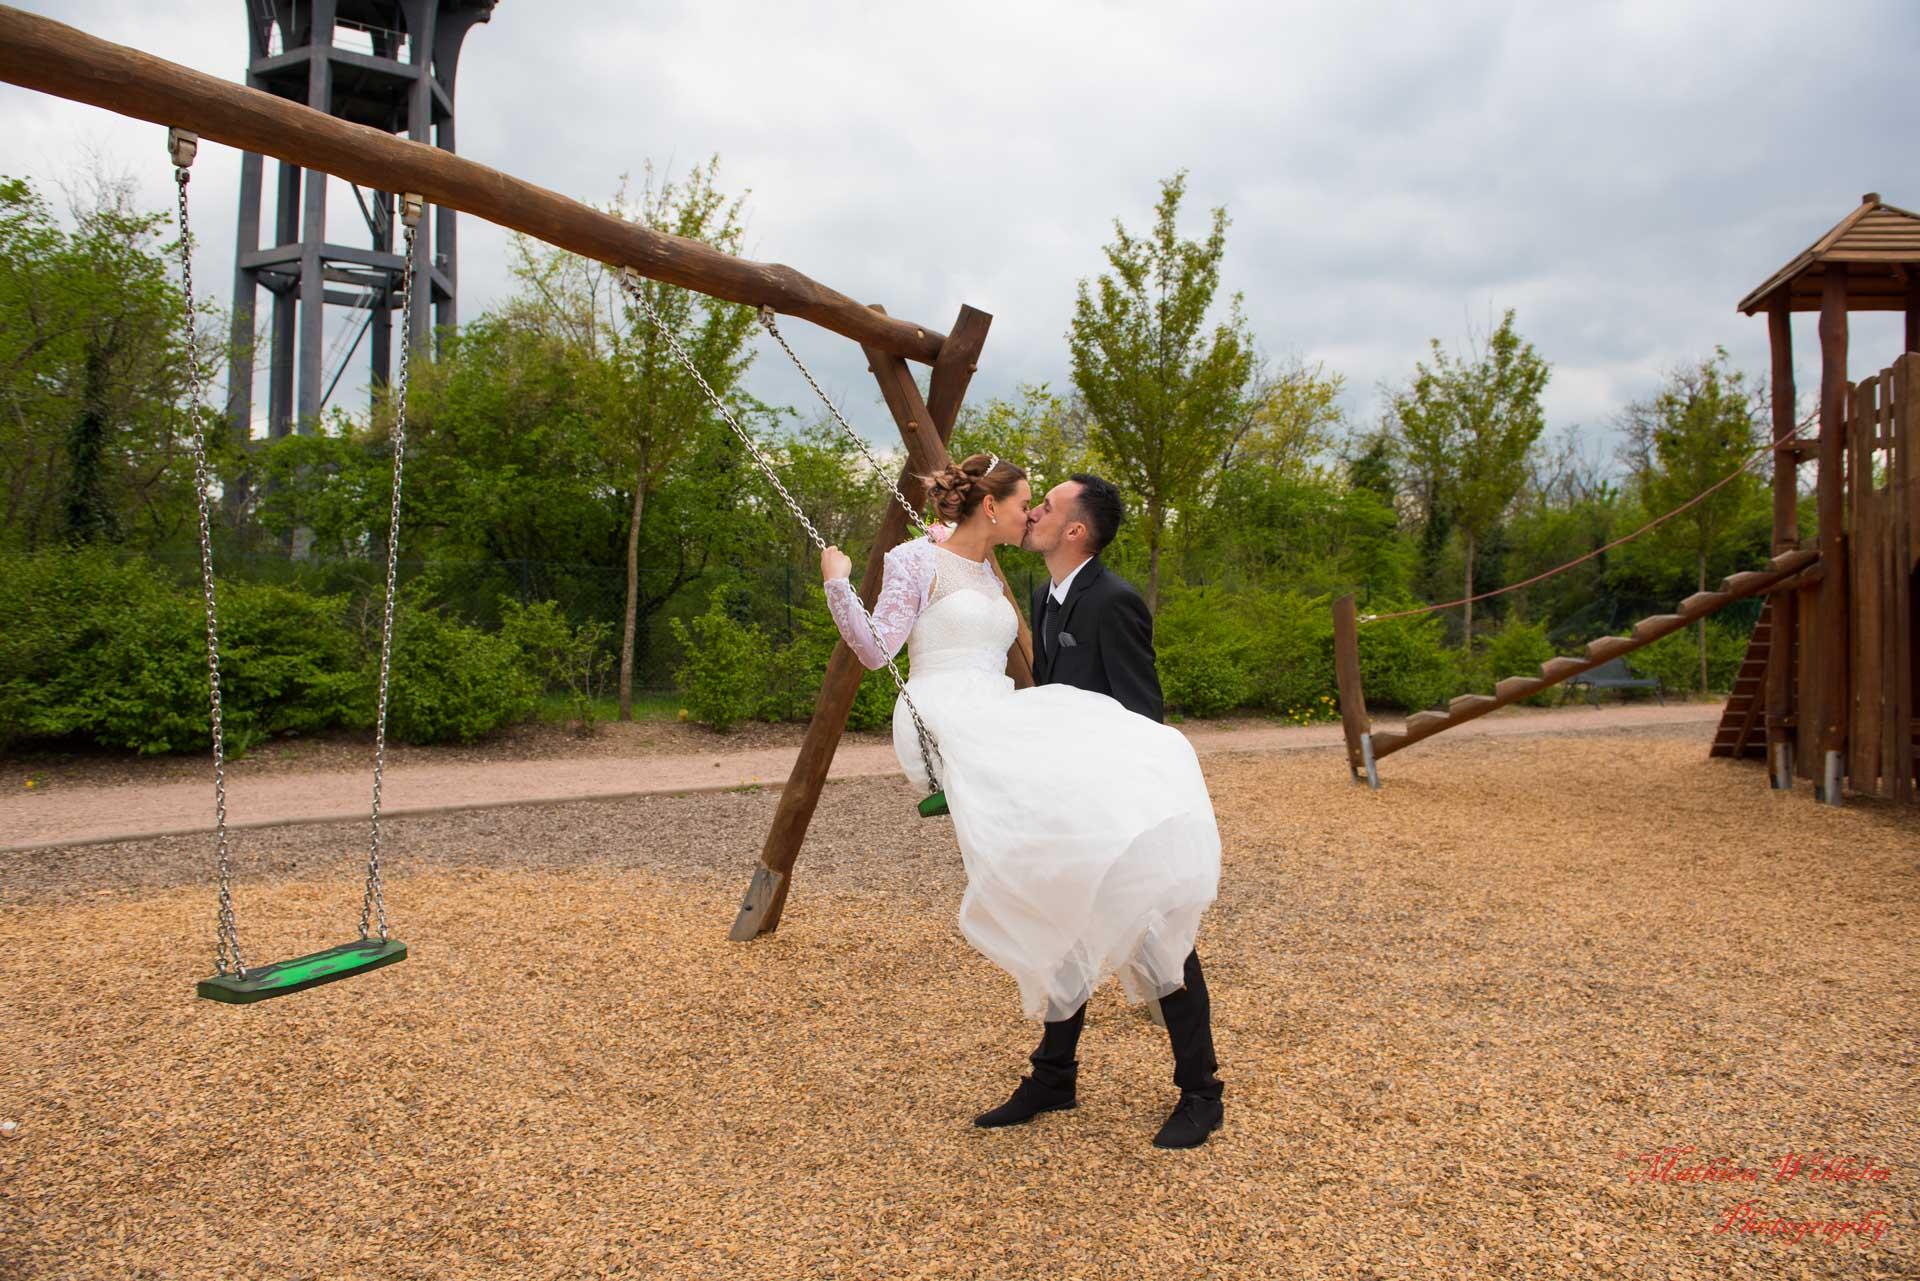 2017-04-15 Adeline Braghiroli - Florian - mariage (331)